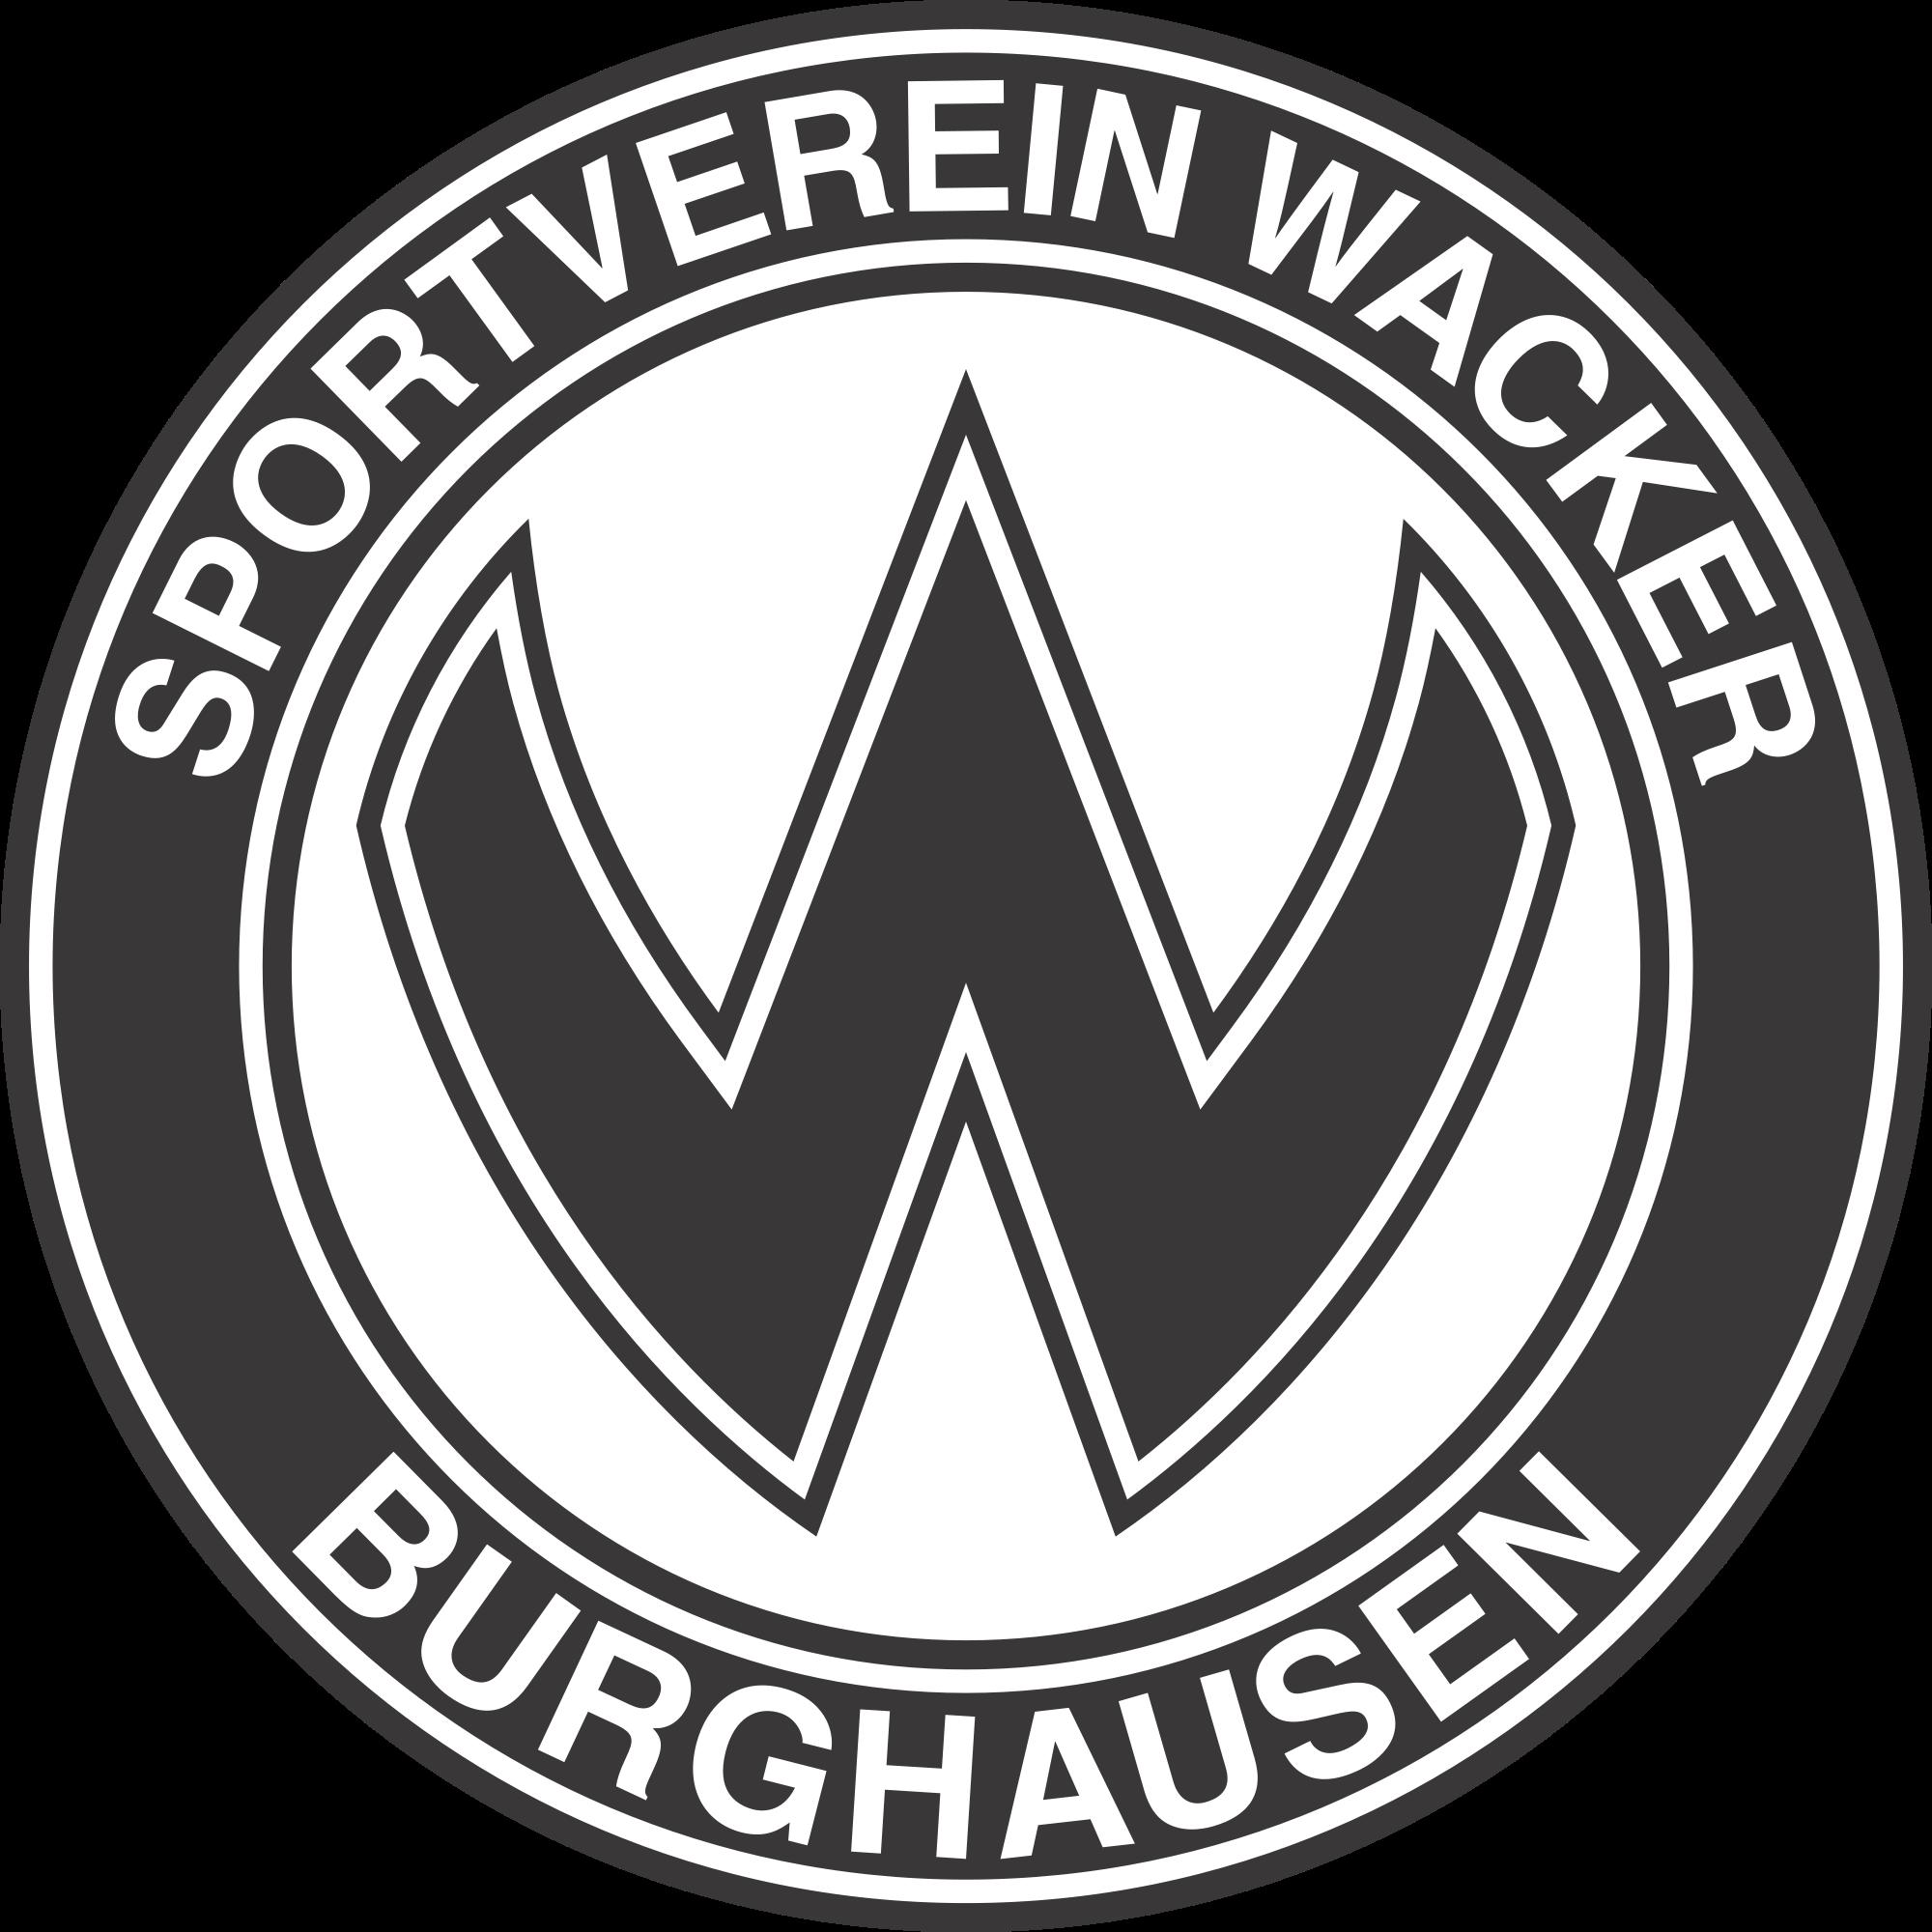 SV Wacker Burghausen / Burghausen / Bavaria / Germany